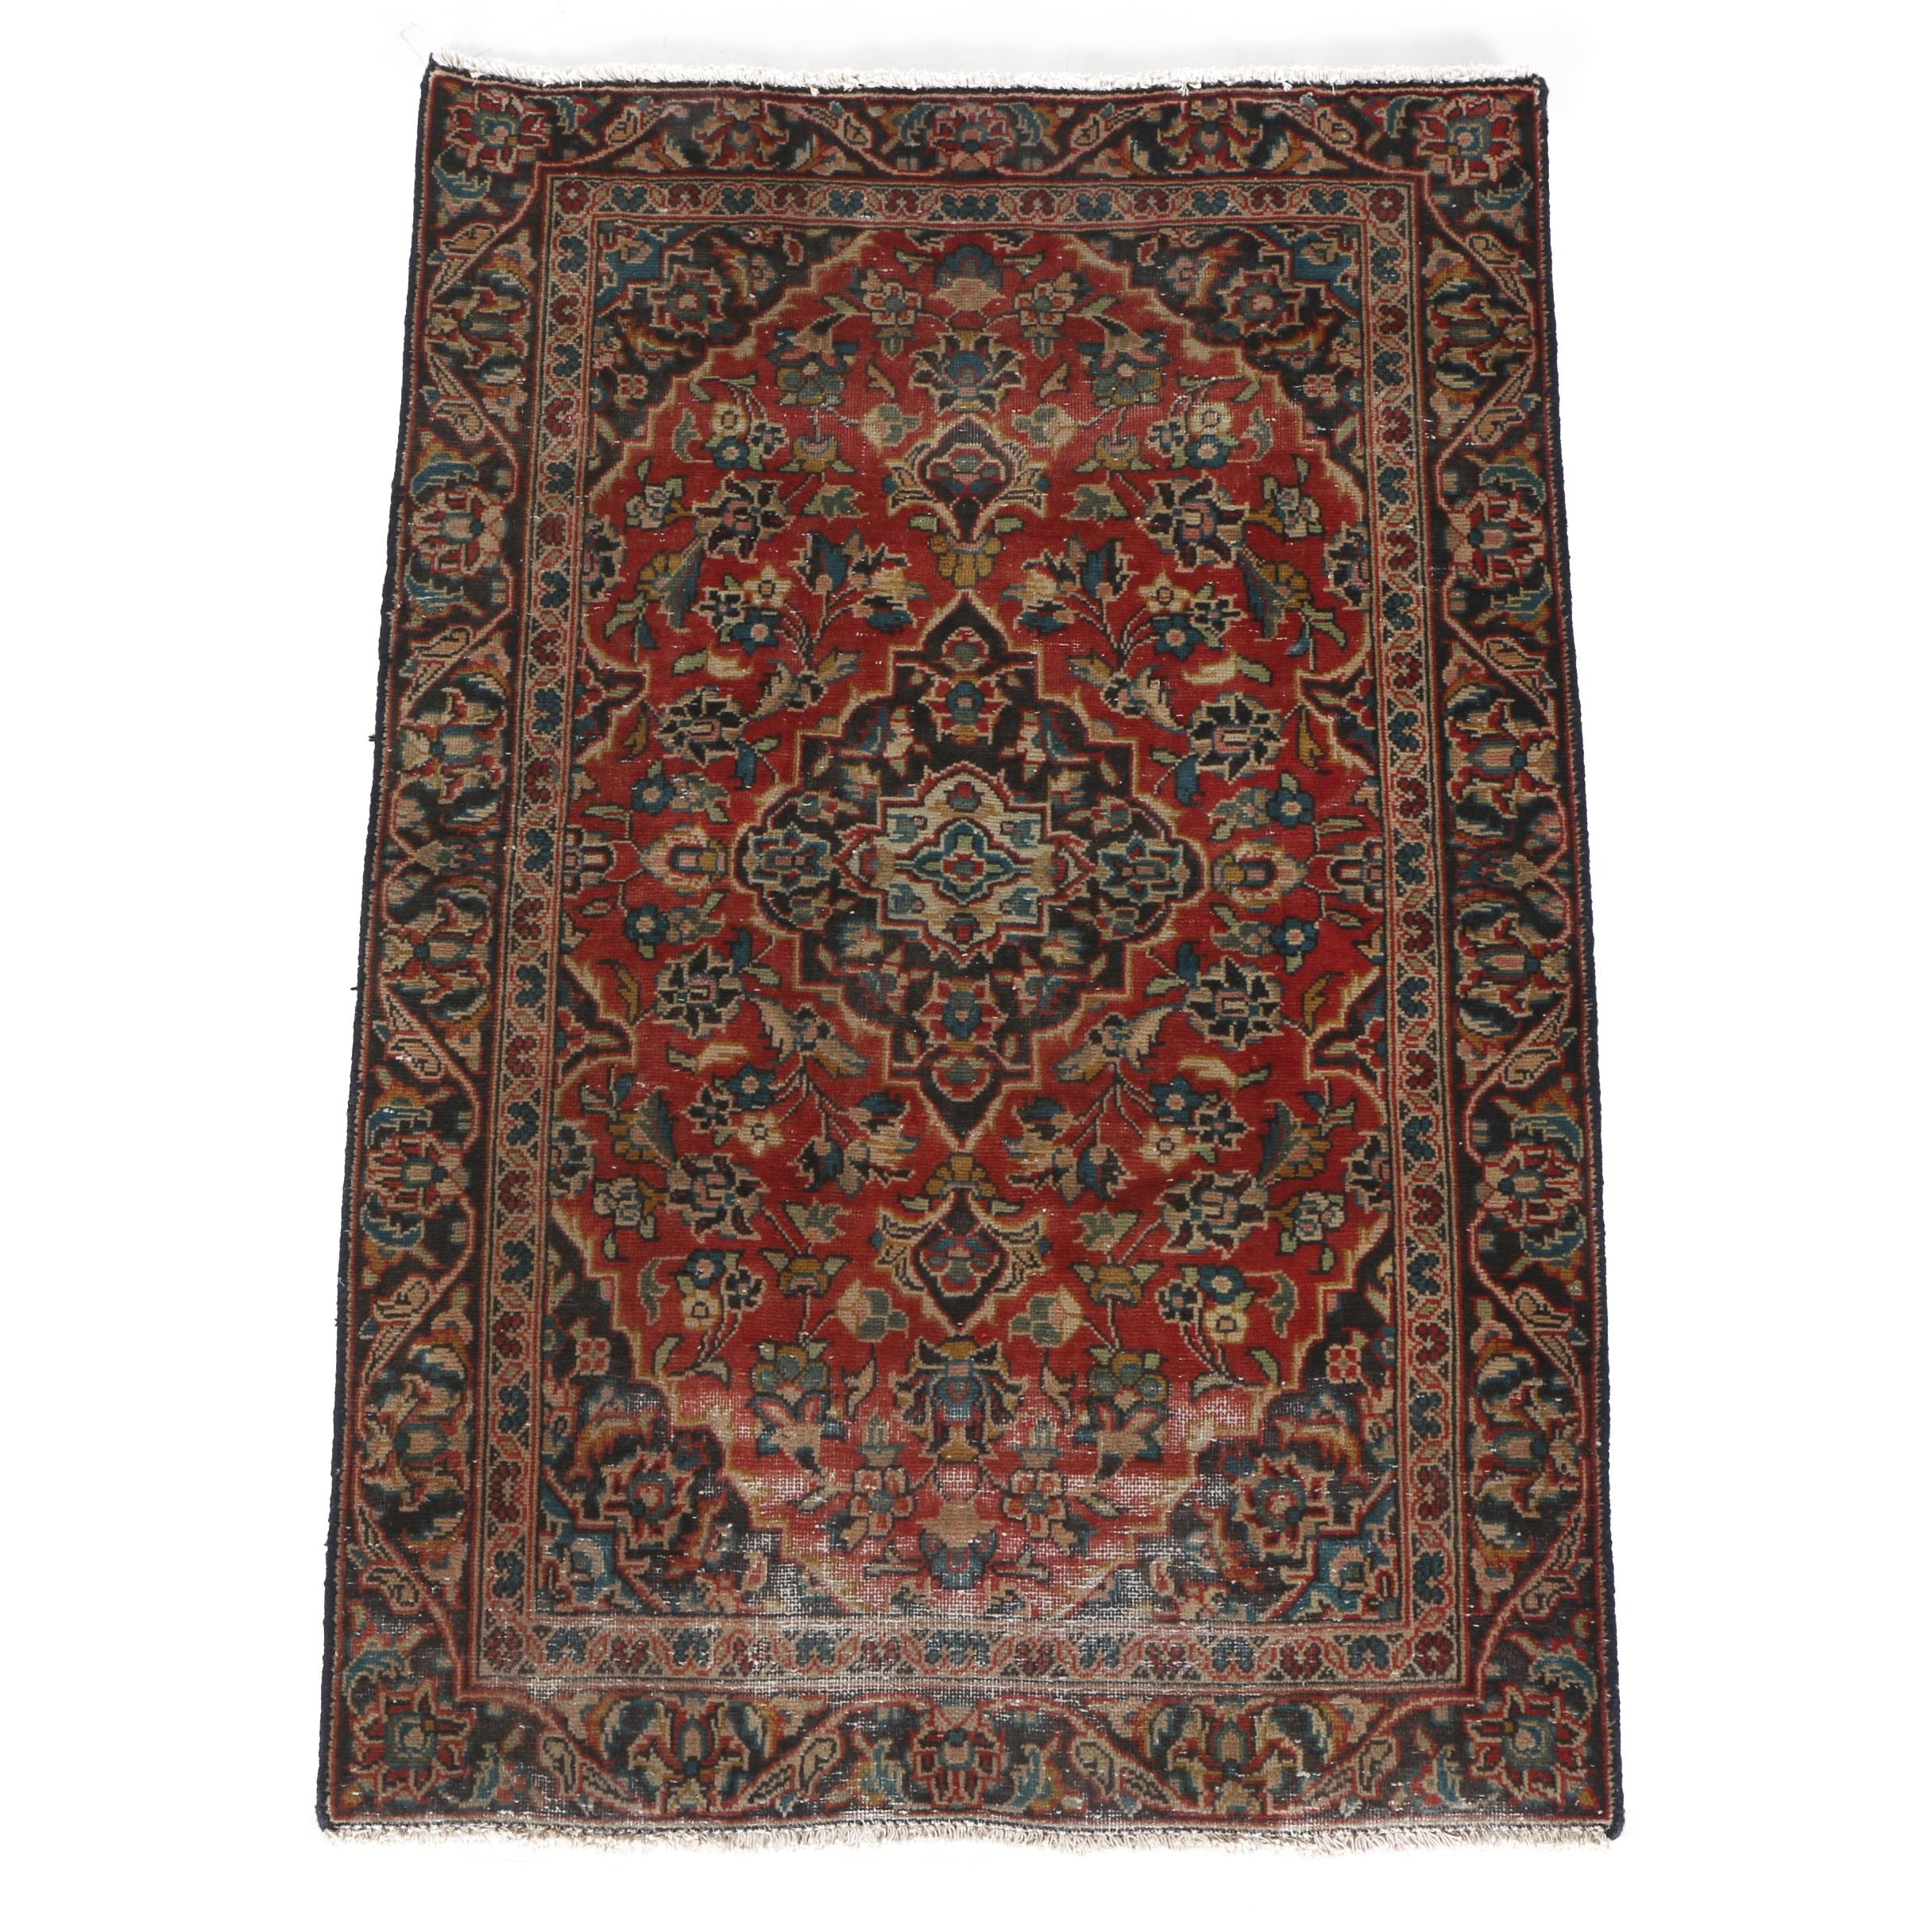 Vintage Handwoven Persian Kashan Wool Accent Rug